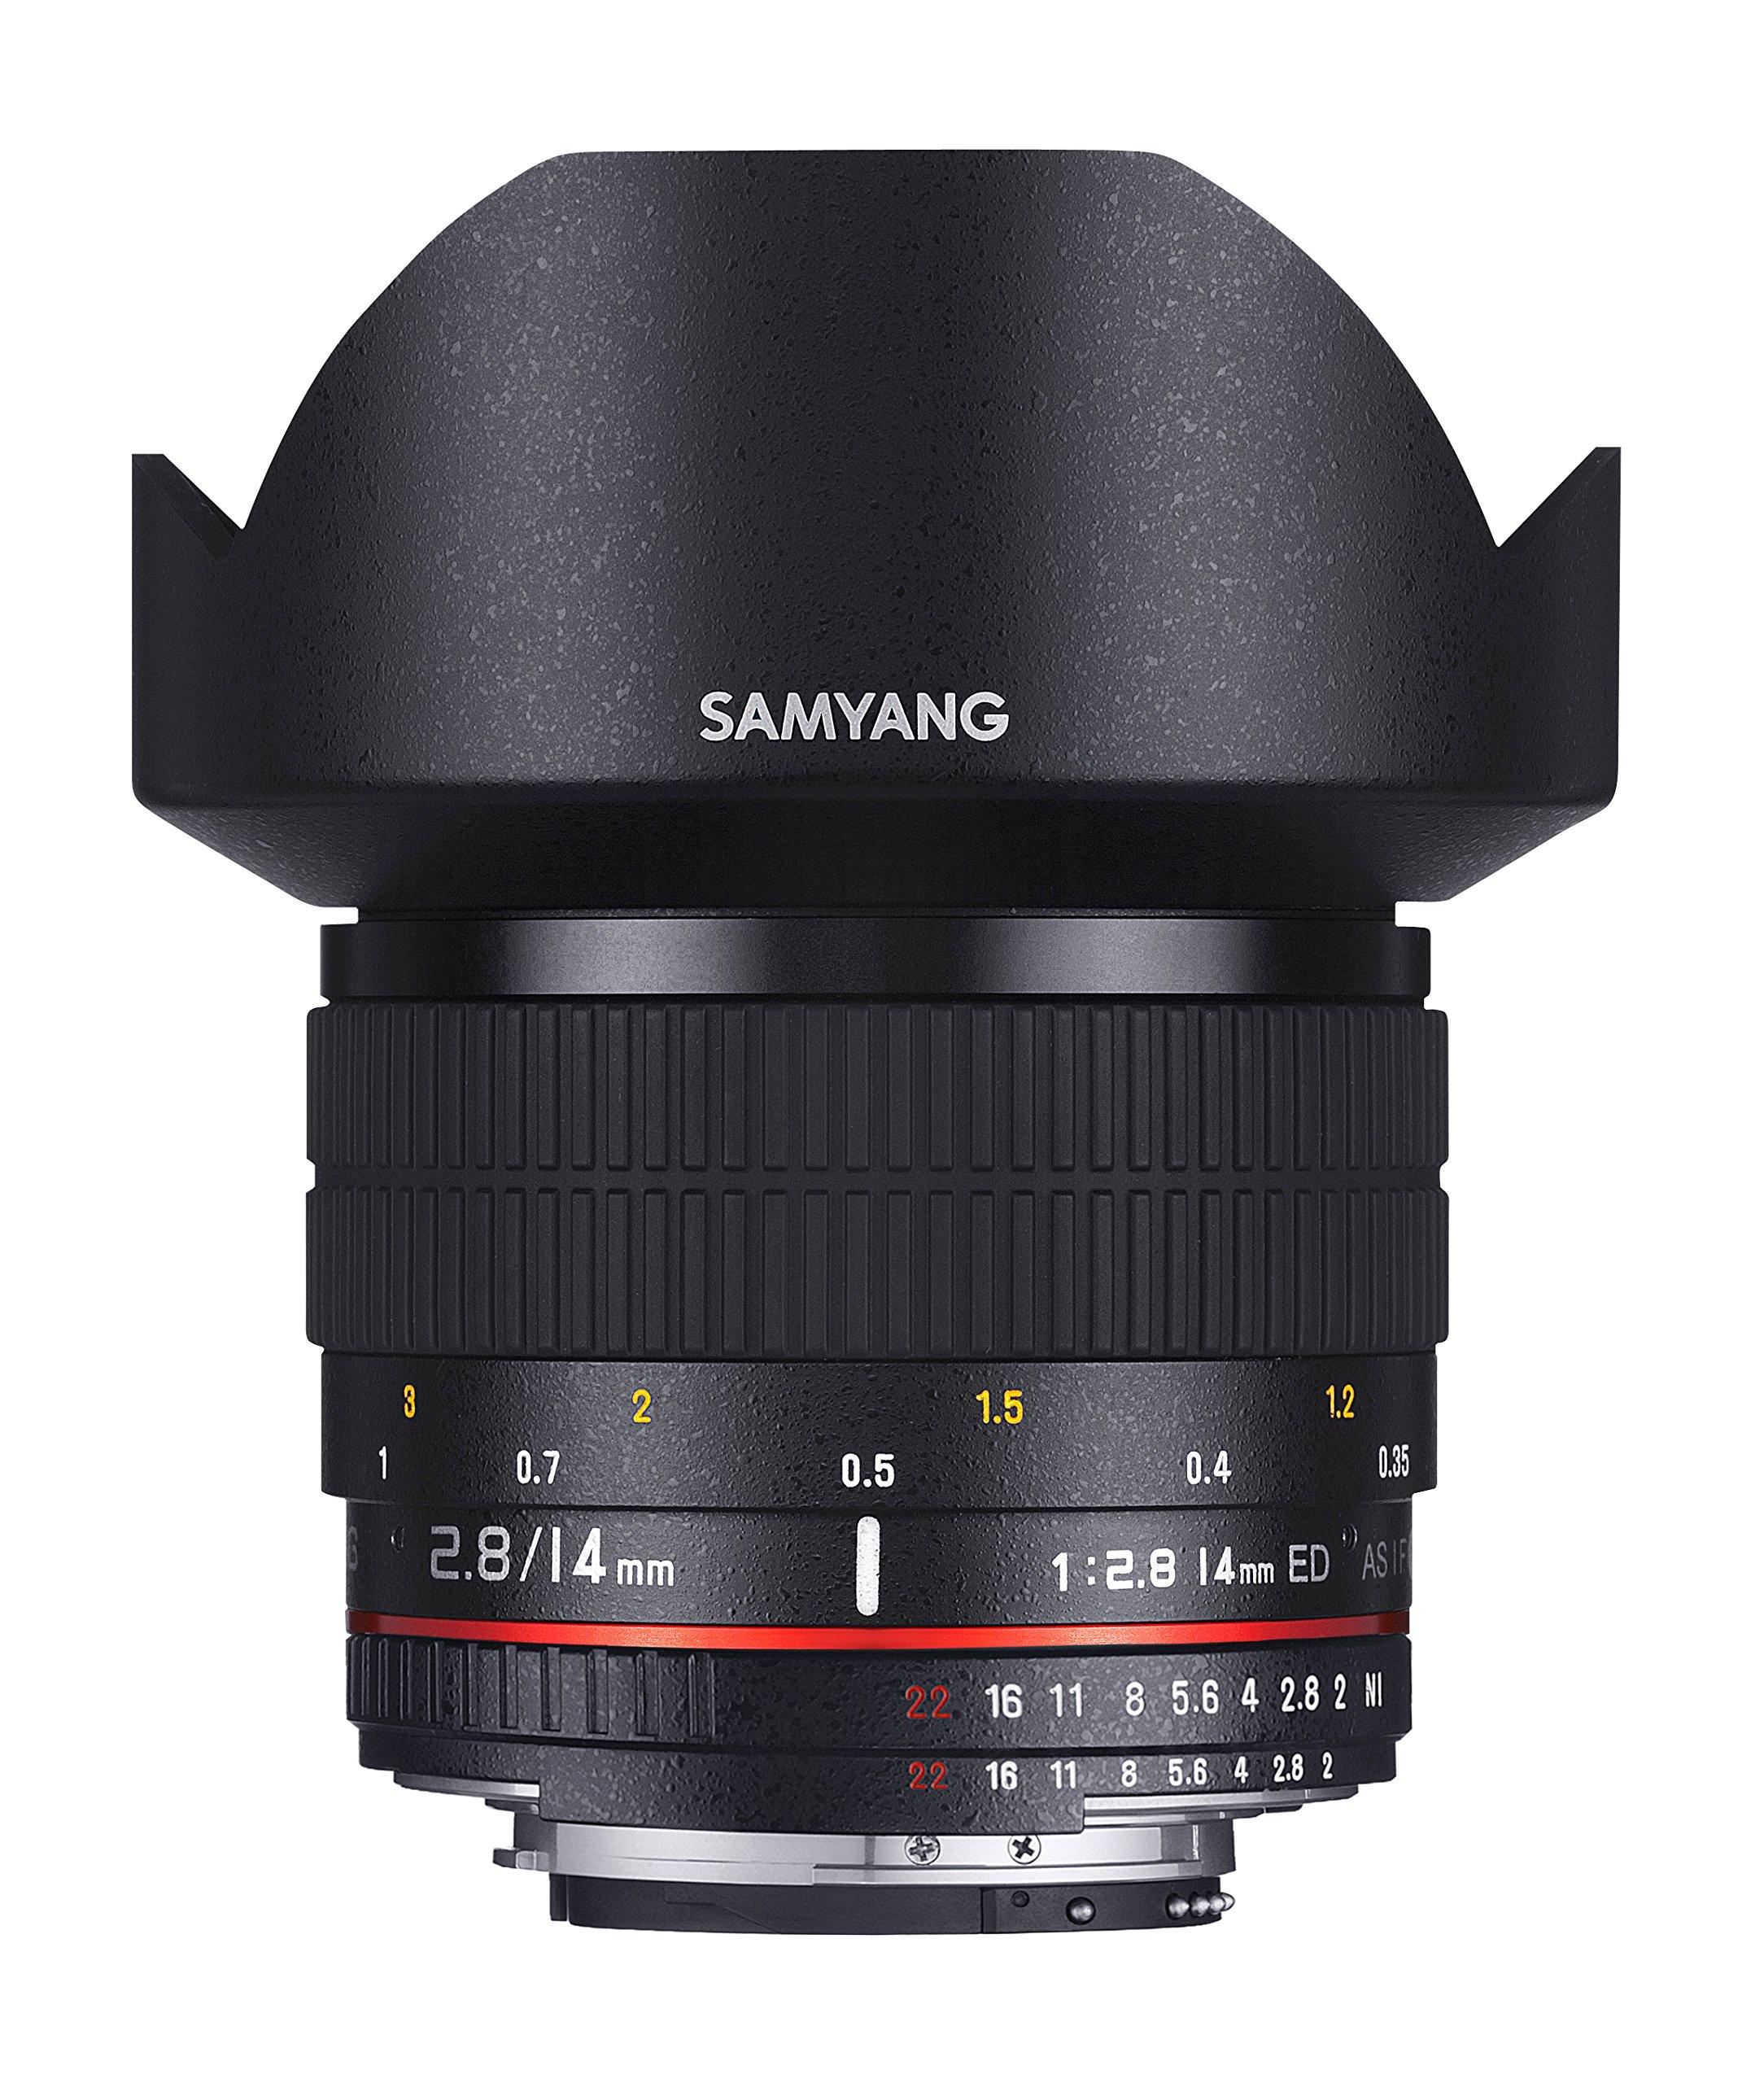 SAMYANG Obiettivo AE 14 mm f/2.8 ED IF UMC Aspherical - grandangolare per fotocamere digitali Nikon